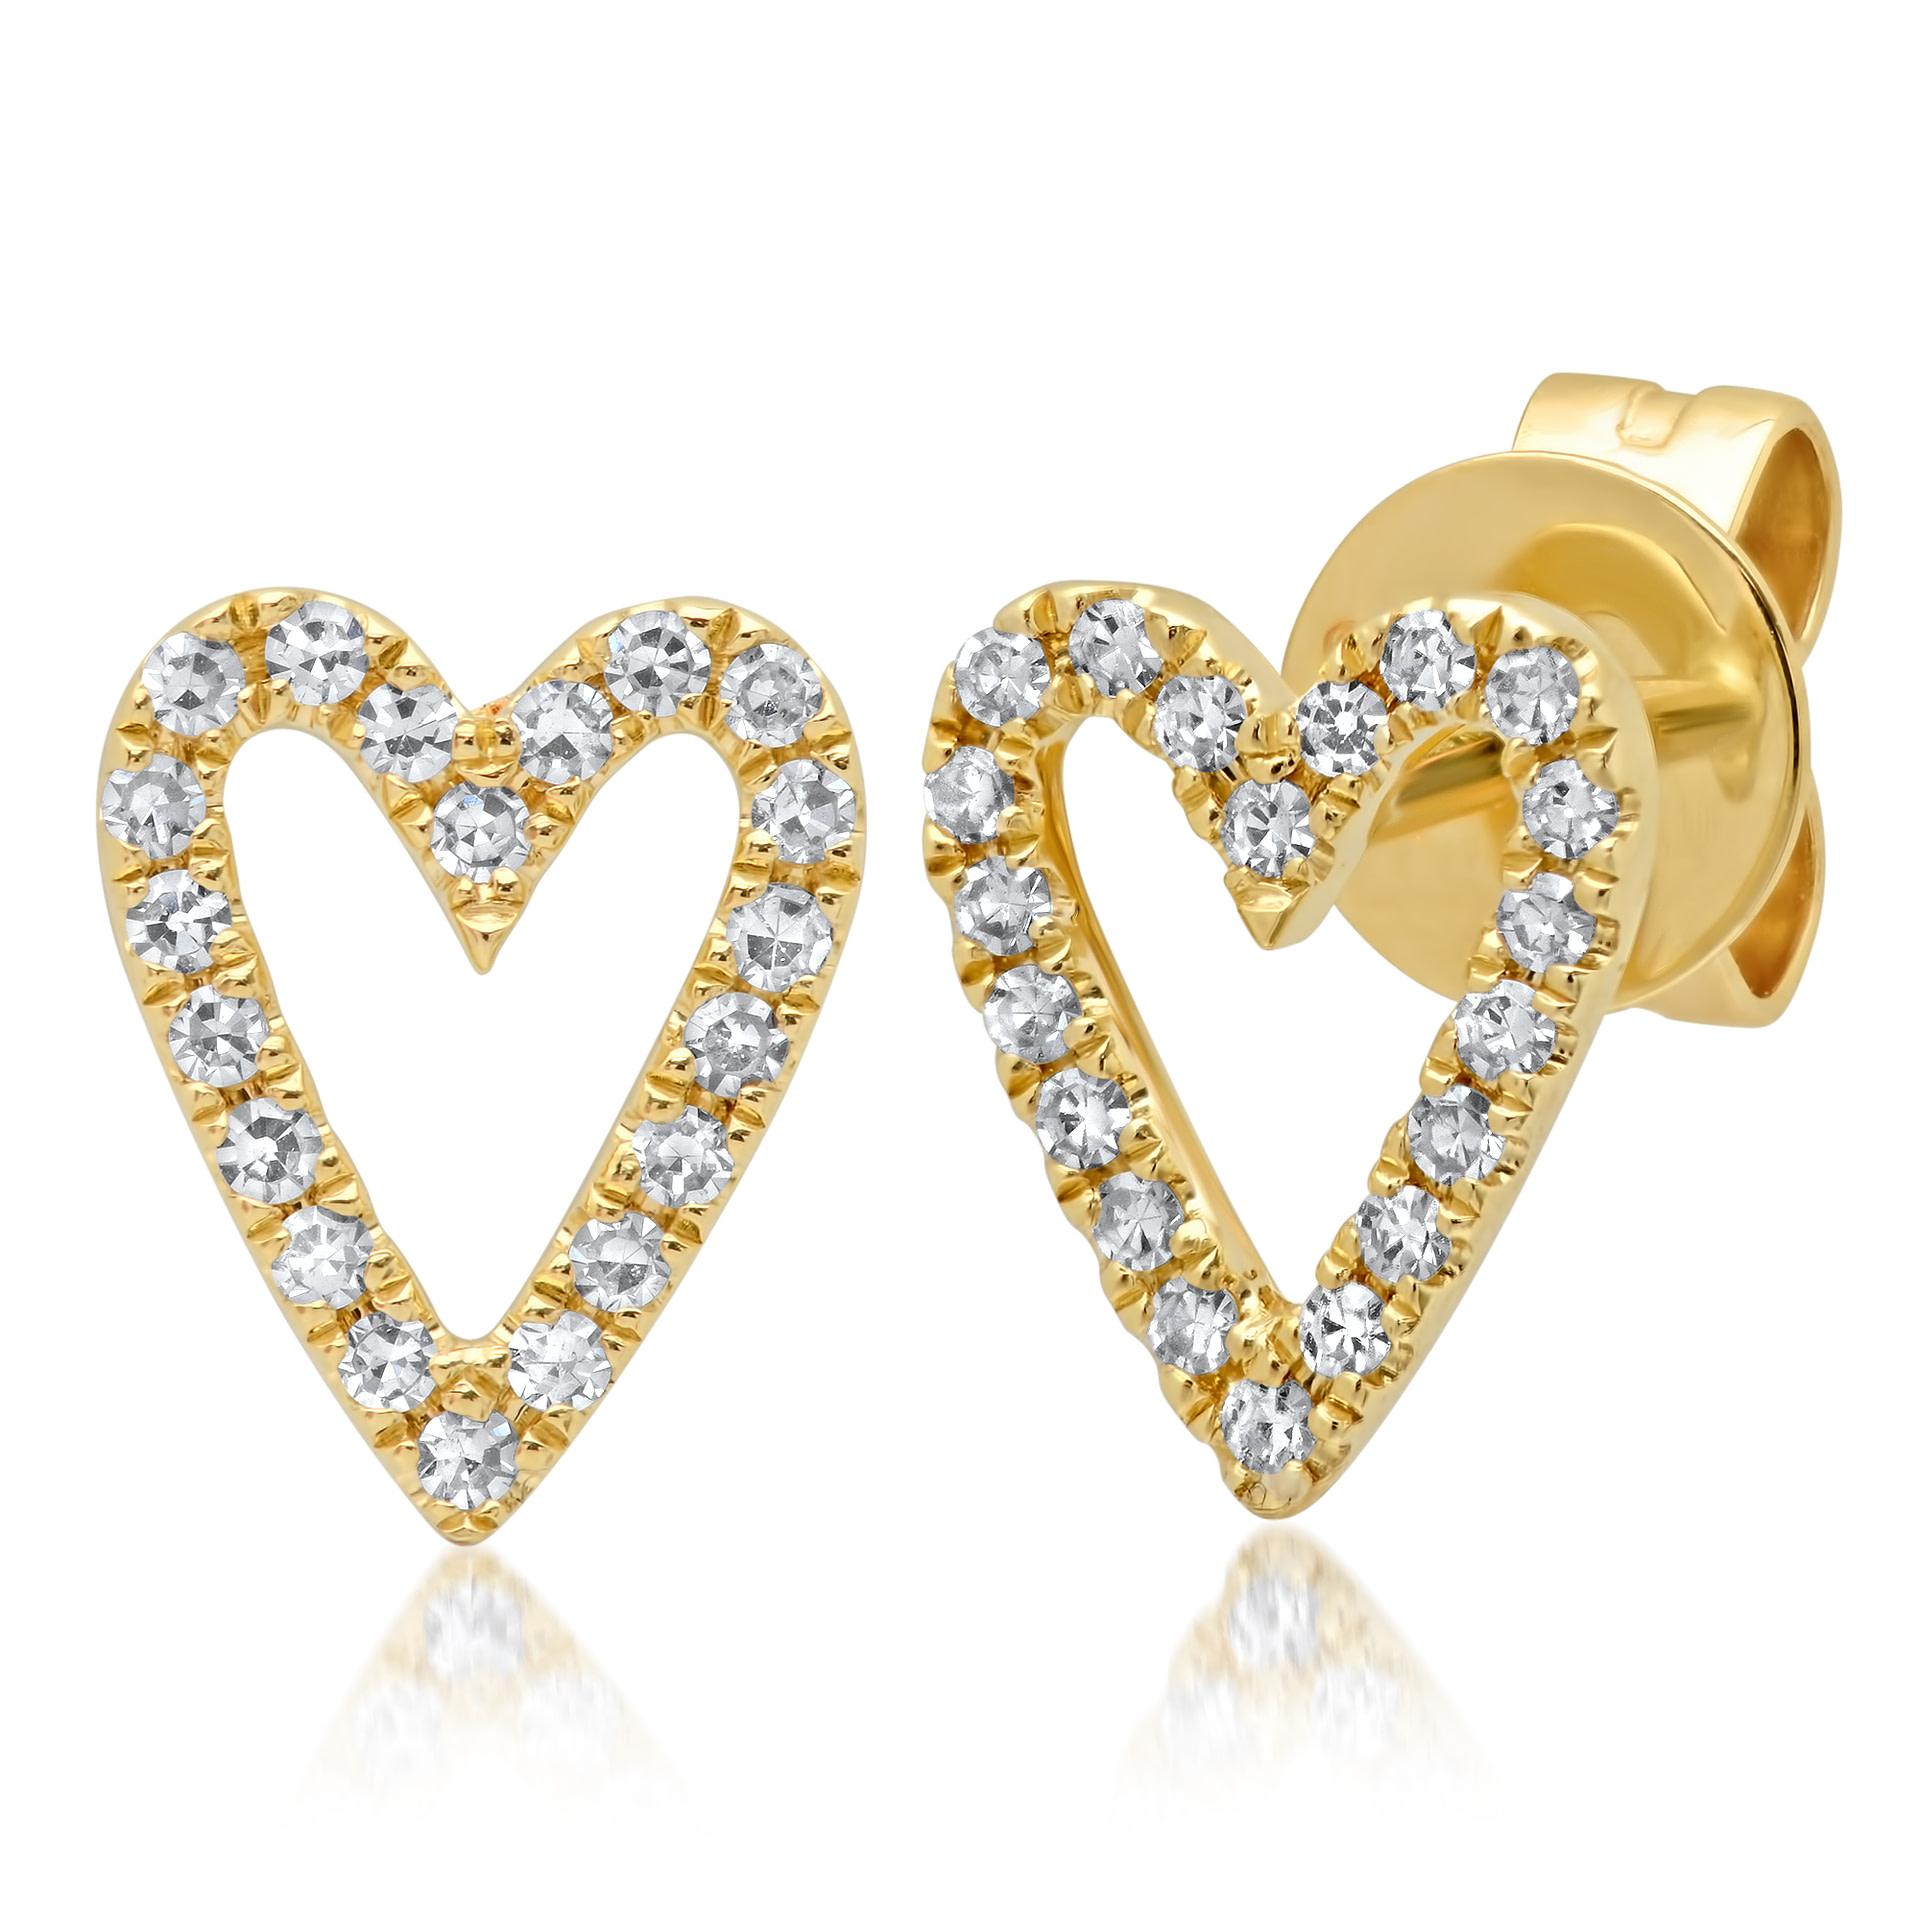 Heart Shaped Diamond Earrings Yellow Gold Jacqui Larsson